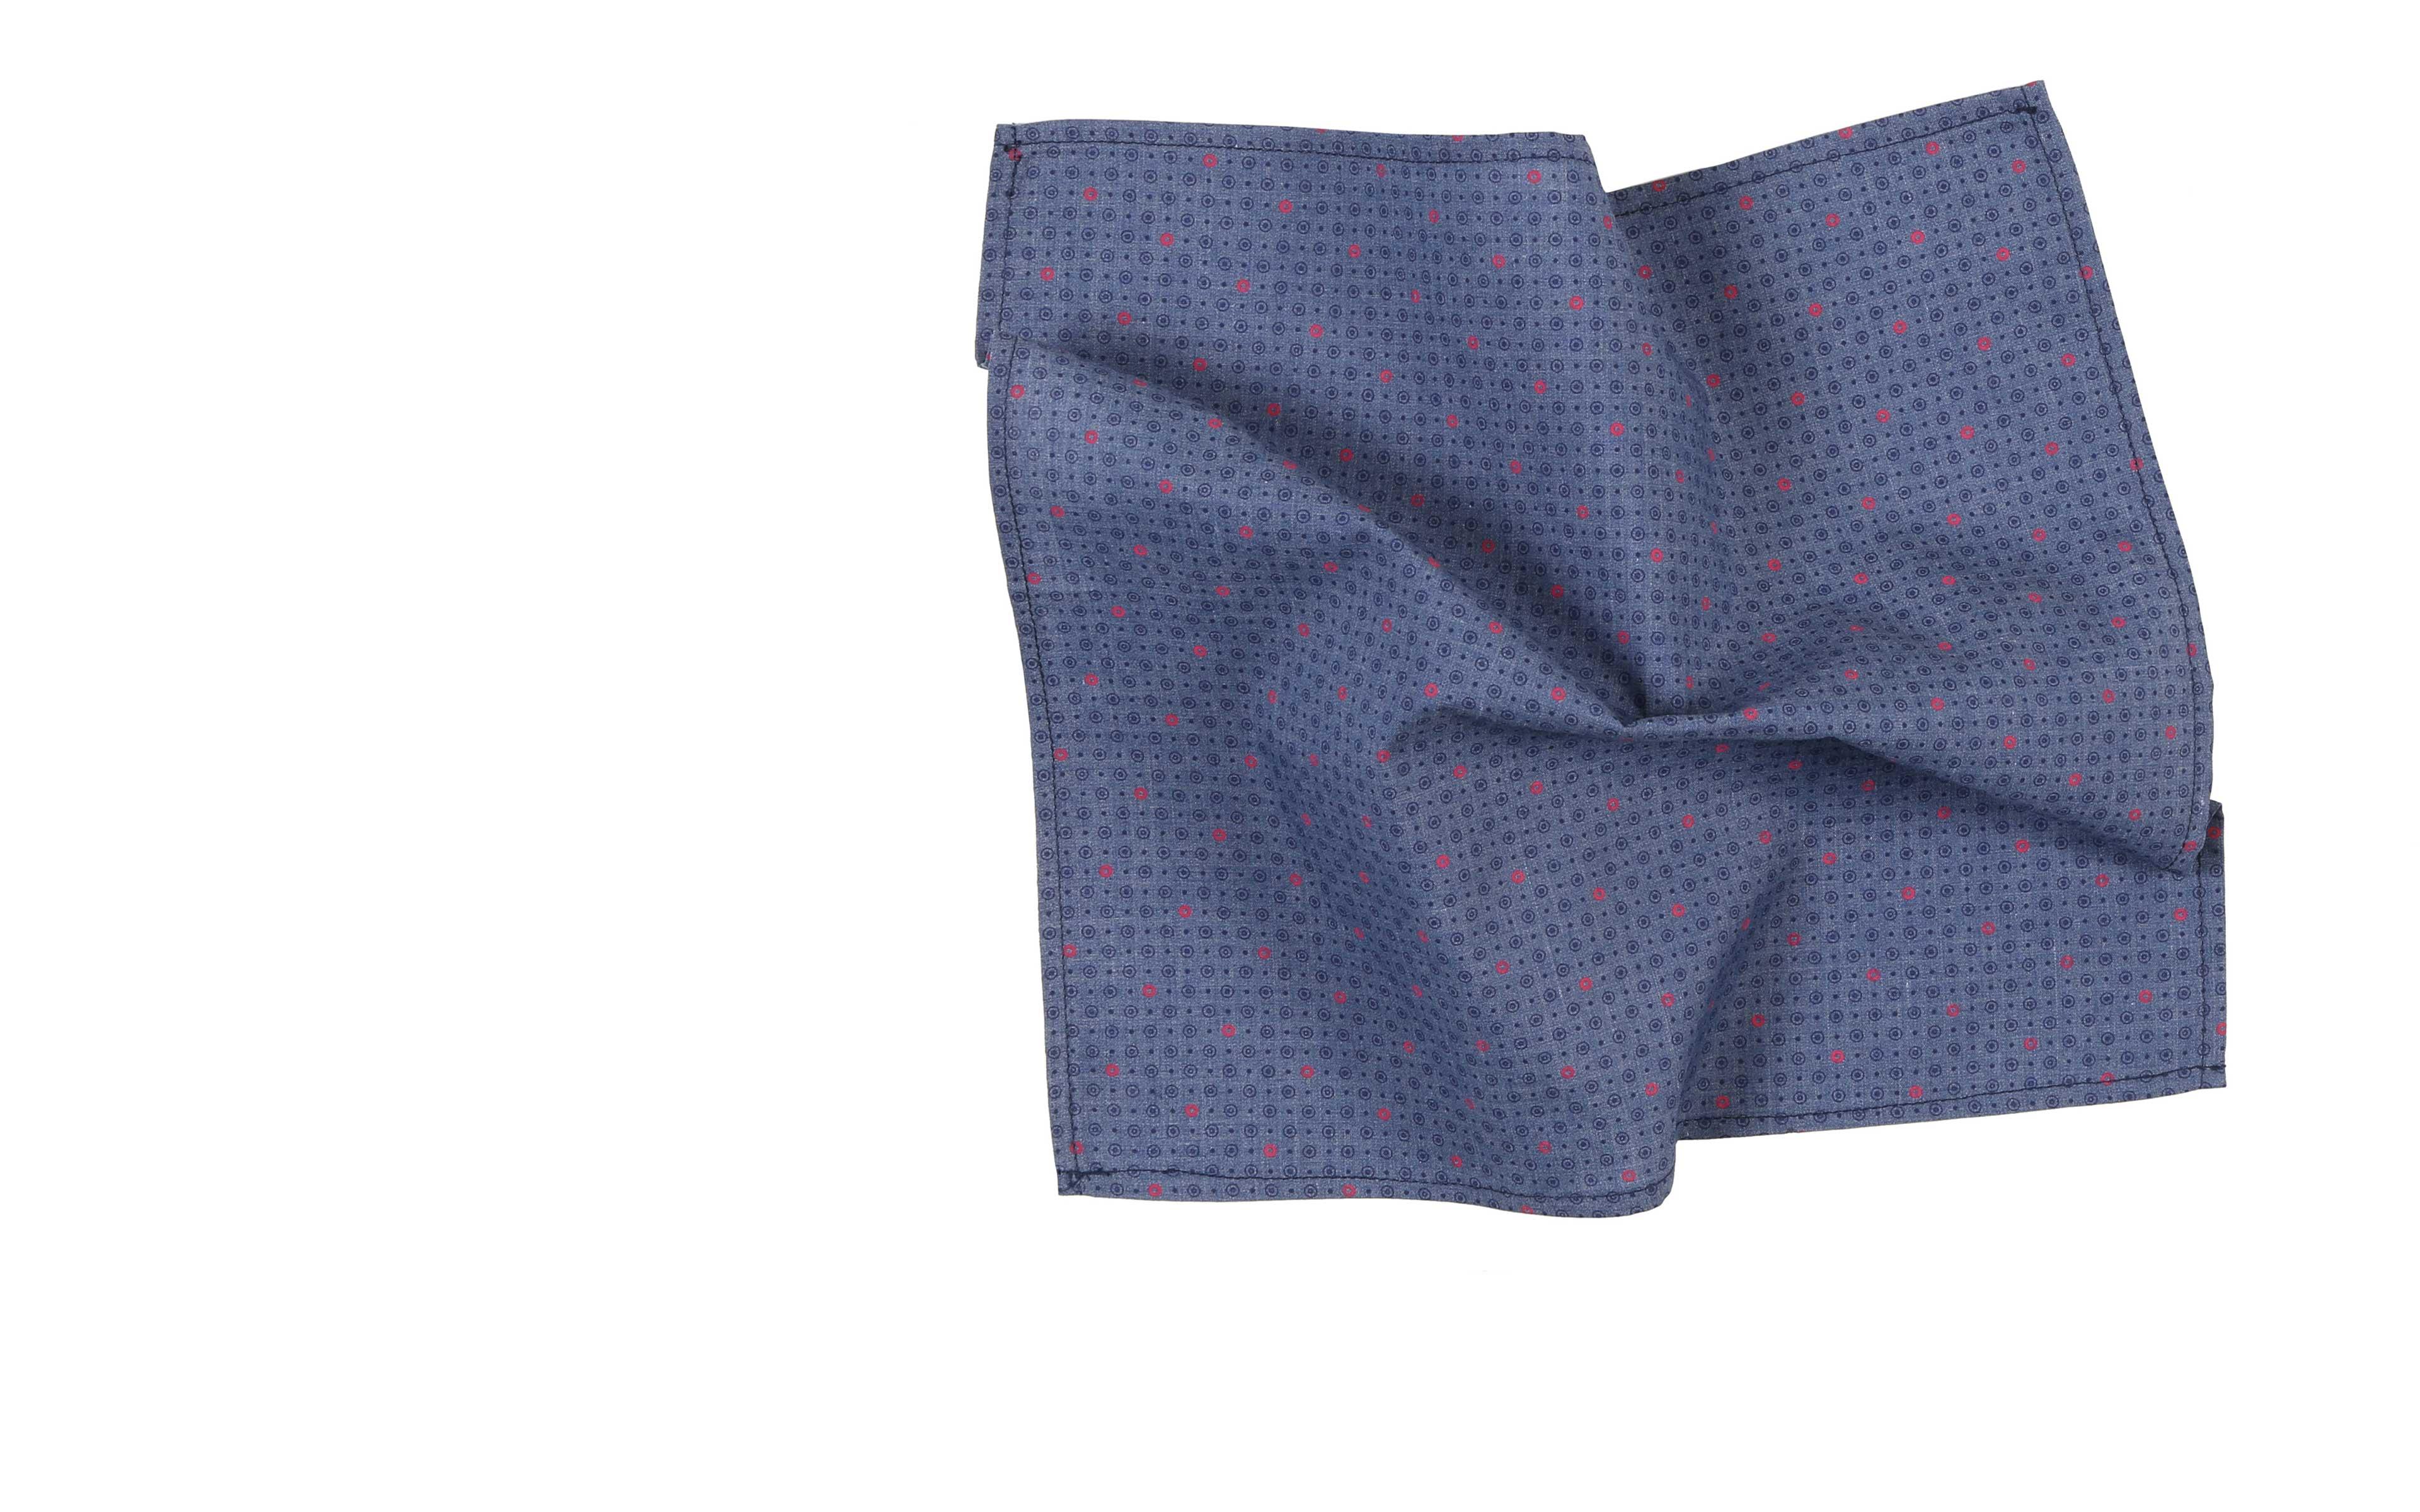 Magenta and Navy Circles Pattern Cotton Pocket Square